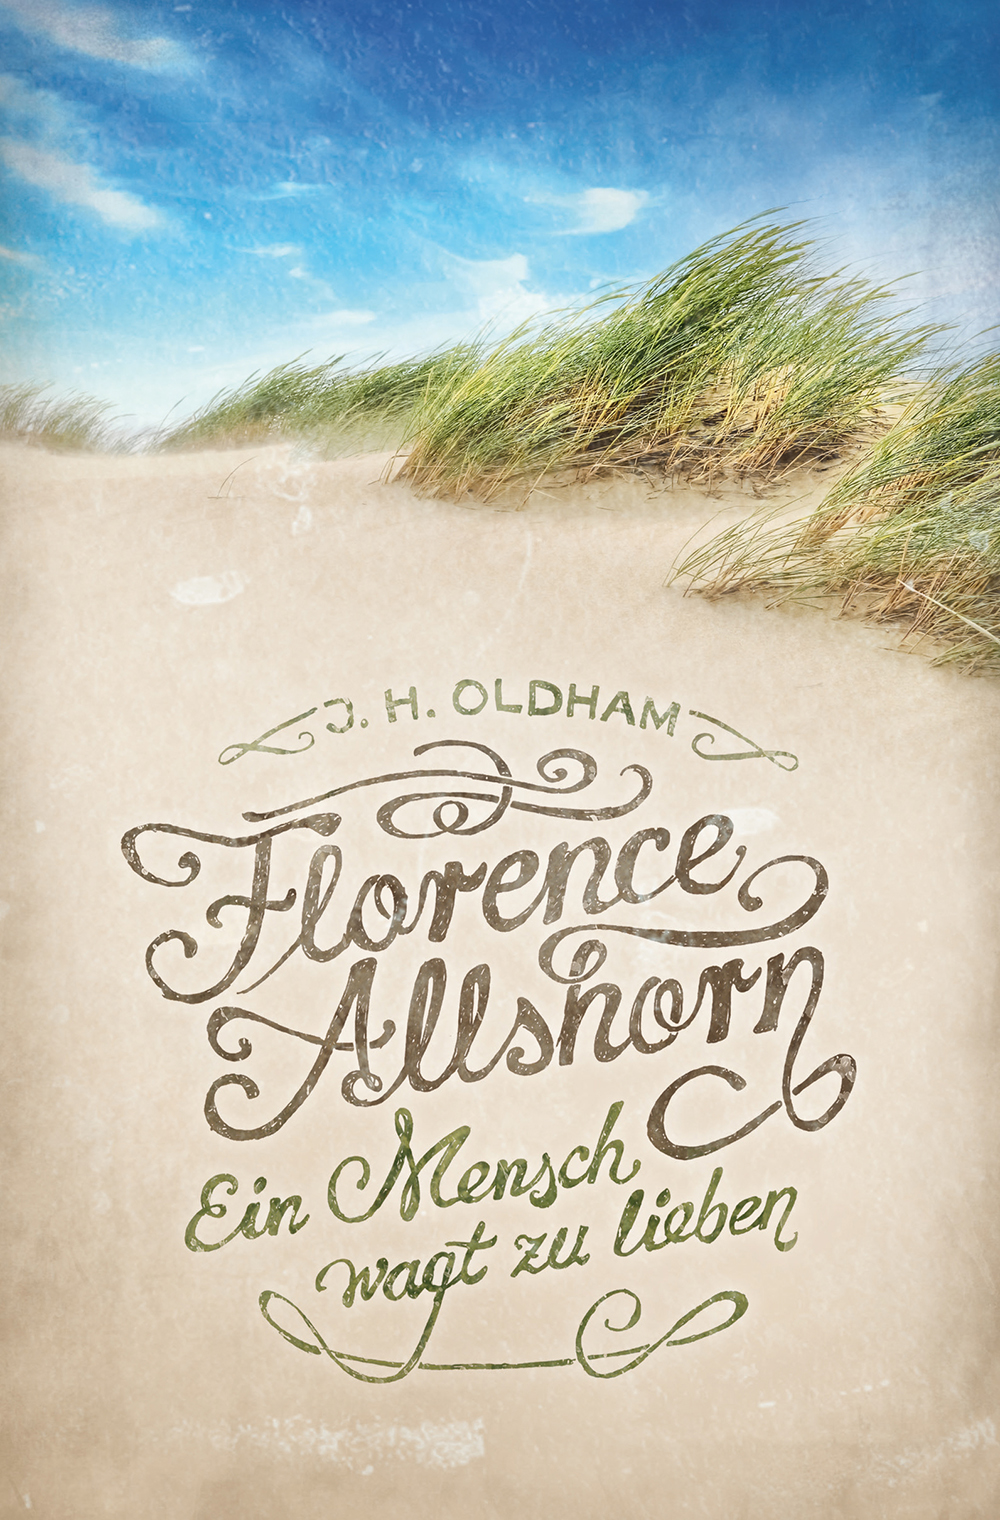 CLV_florence-allshorn_j-h-oldham_256254_1